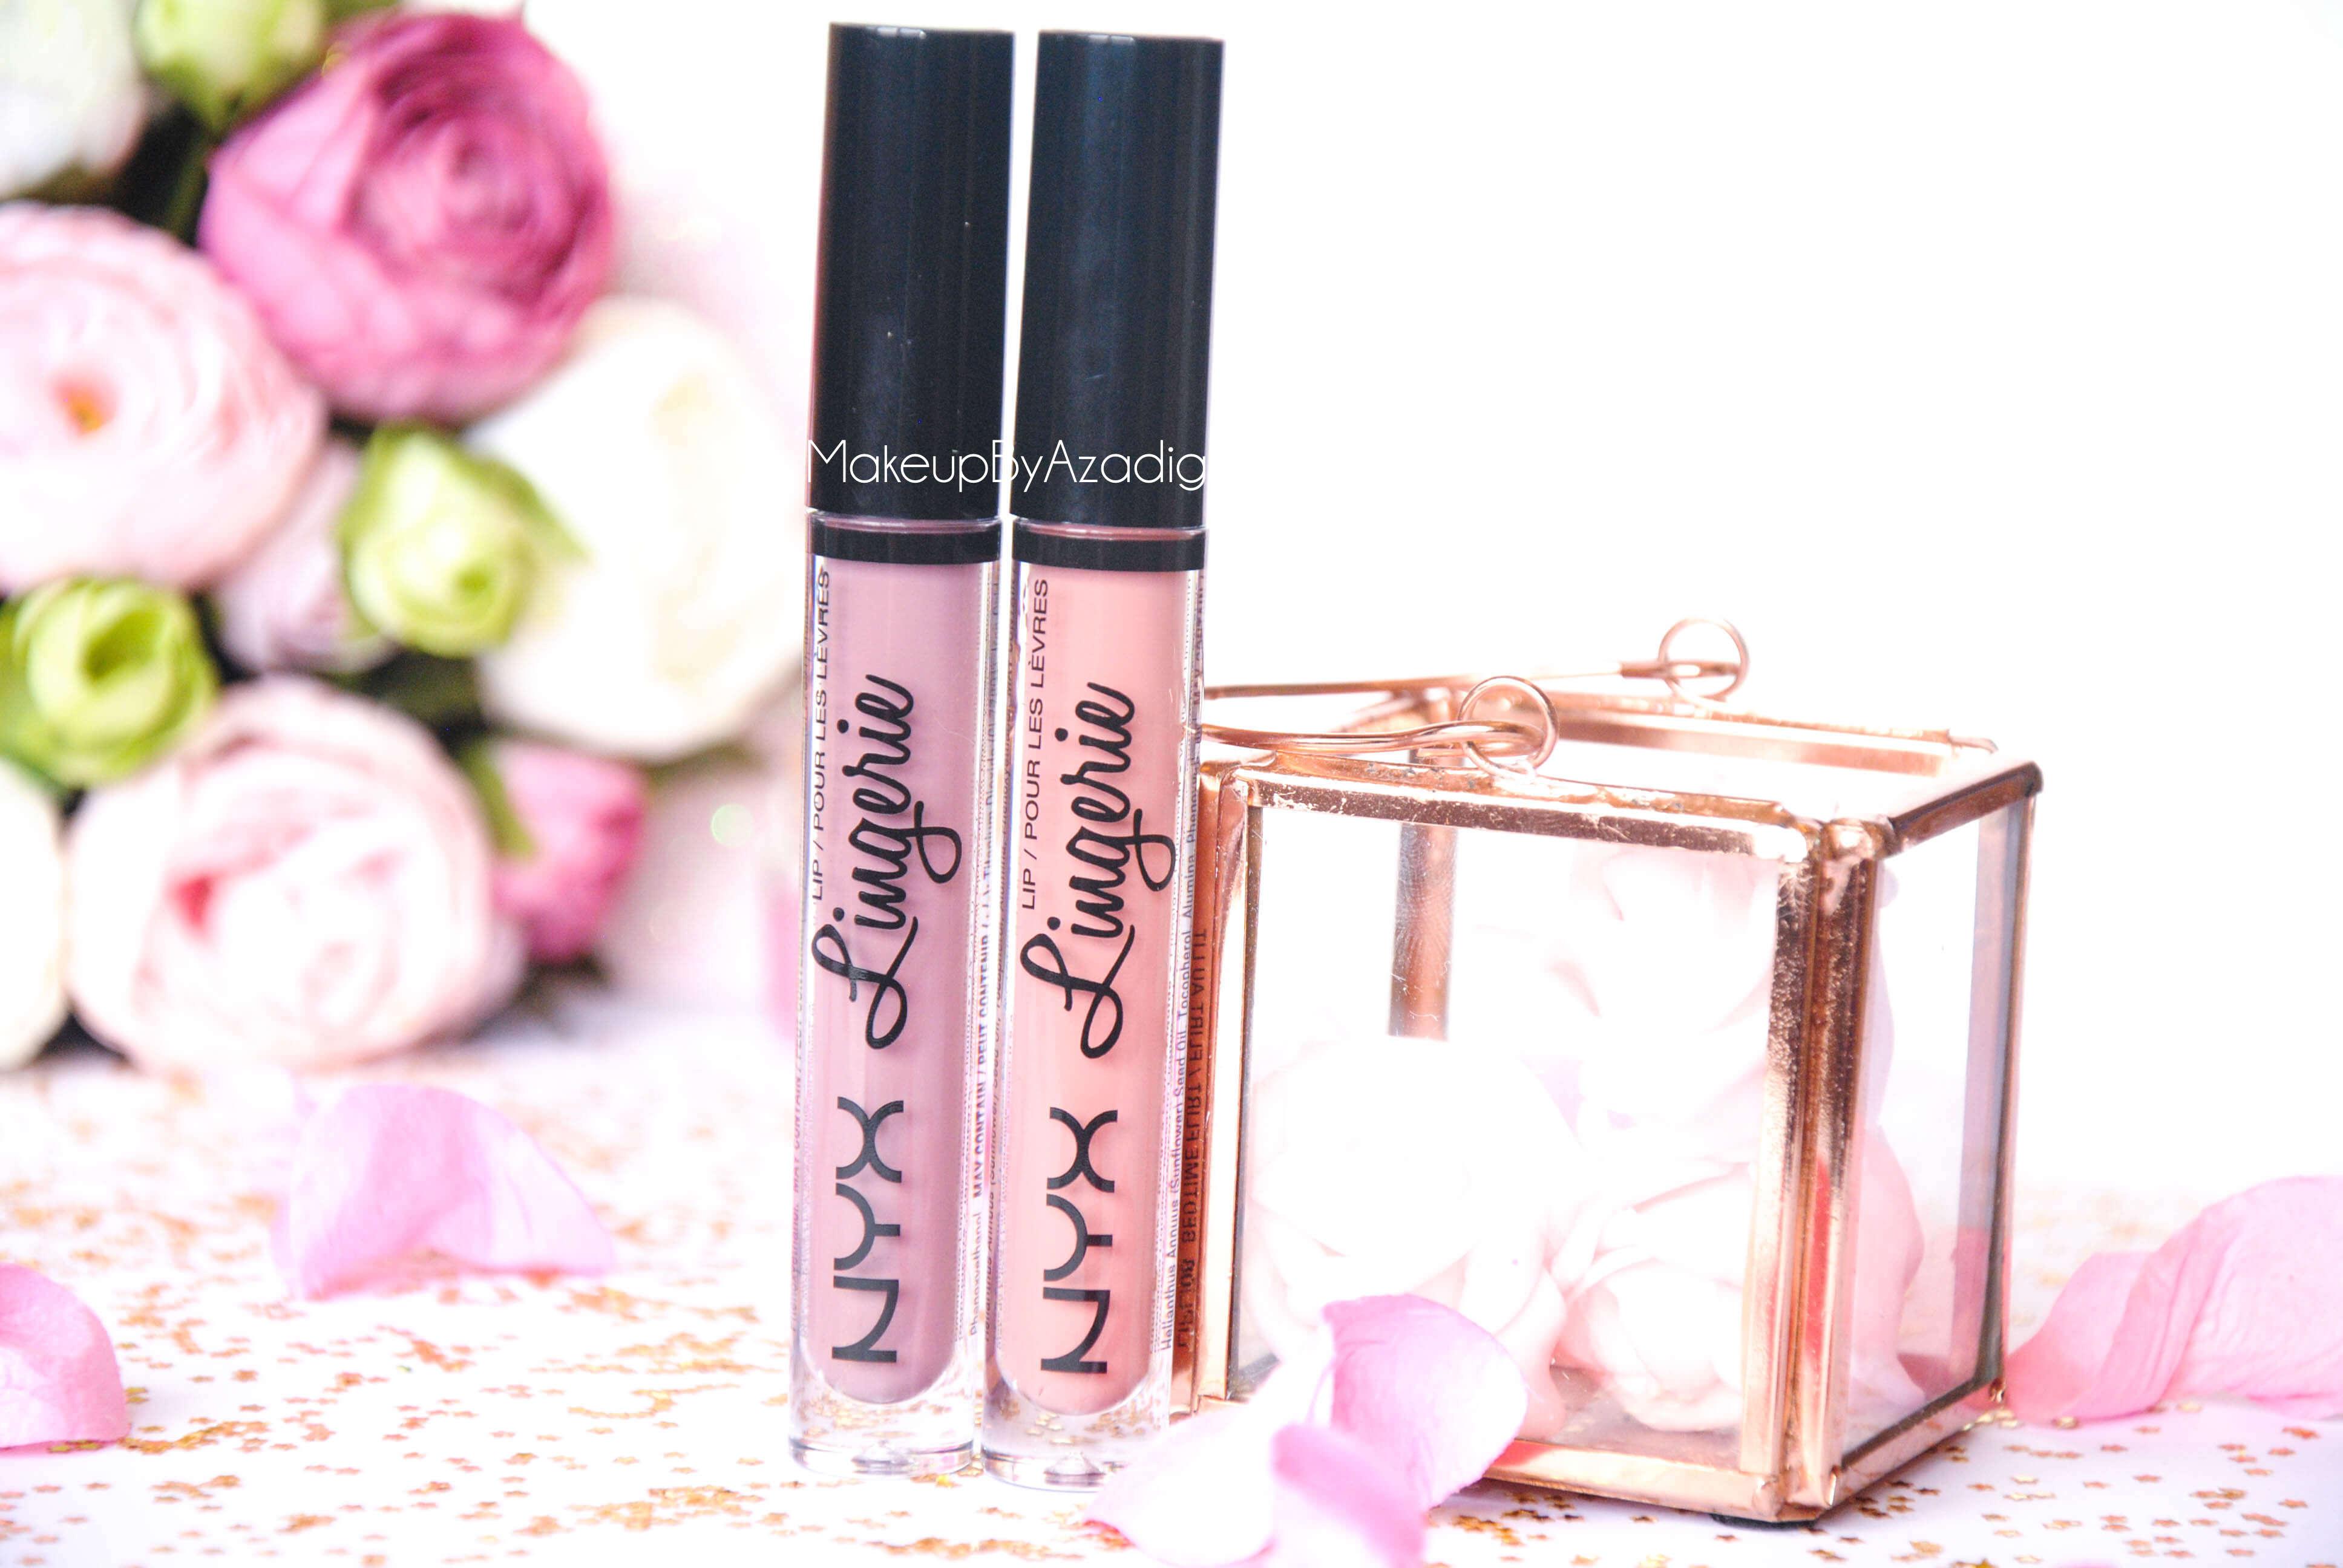 lip lingerie - revue - swatch- nyx cosmetics - embellishment - bedtime flirt - makeupbyazadig - enjoyphoenix - troyes - mat